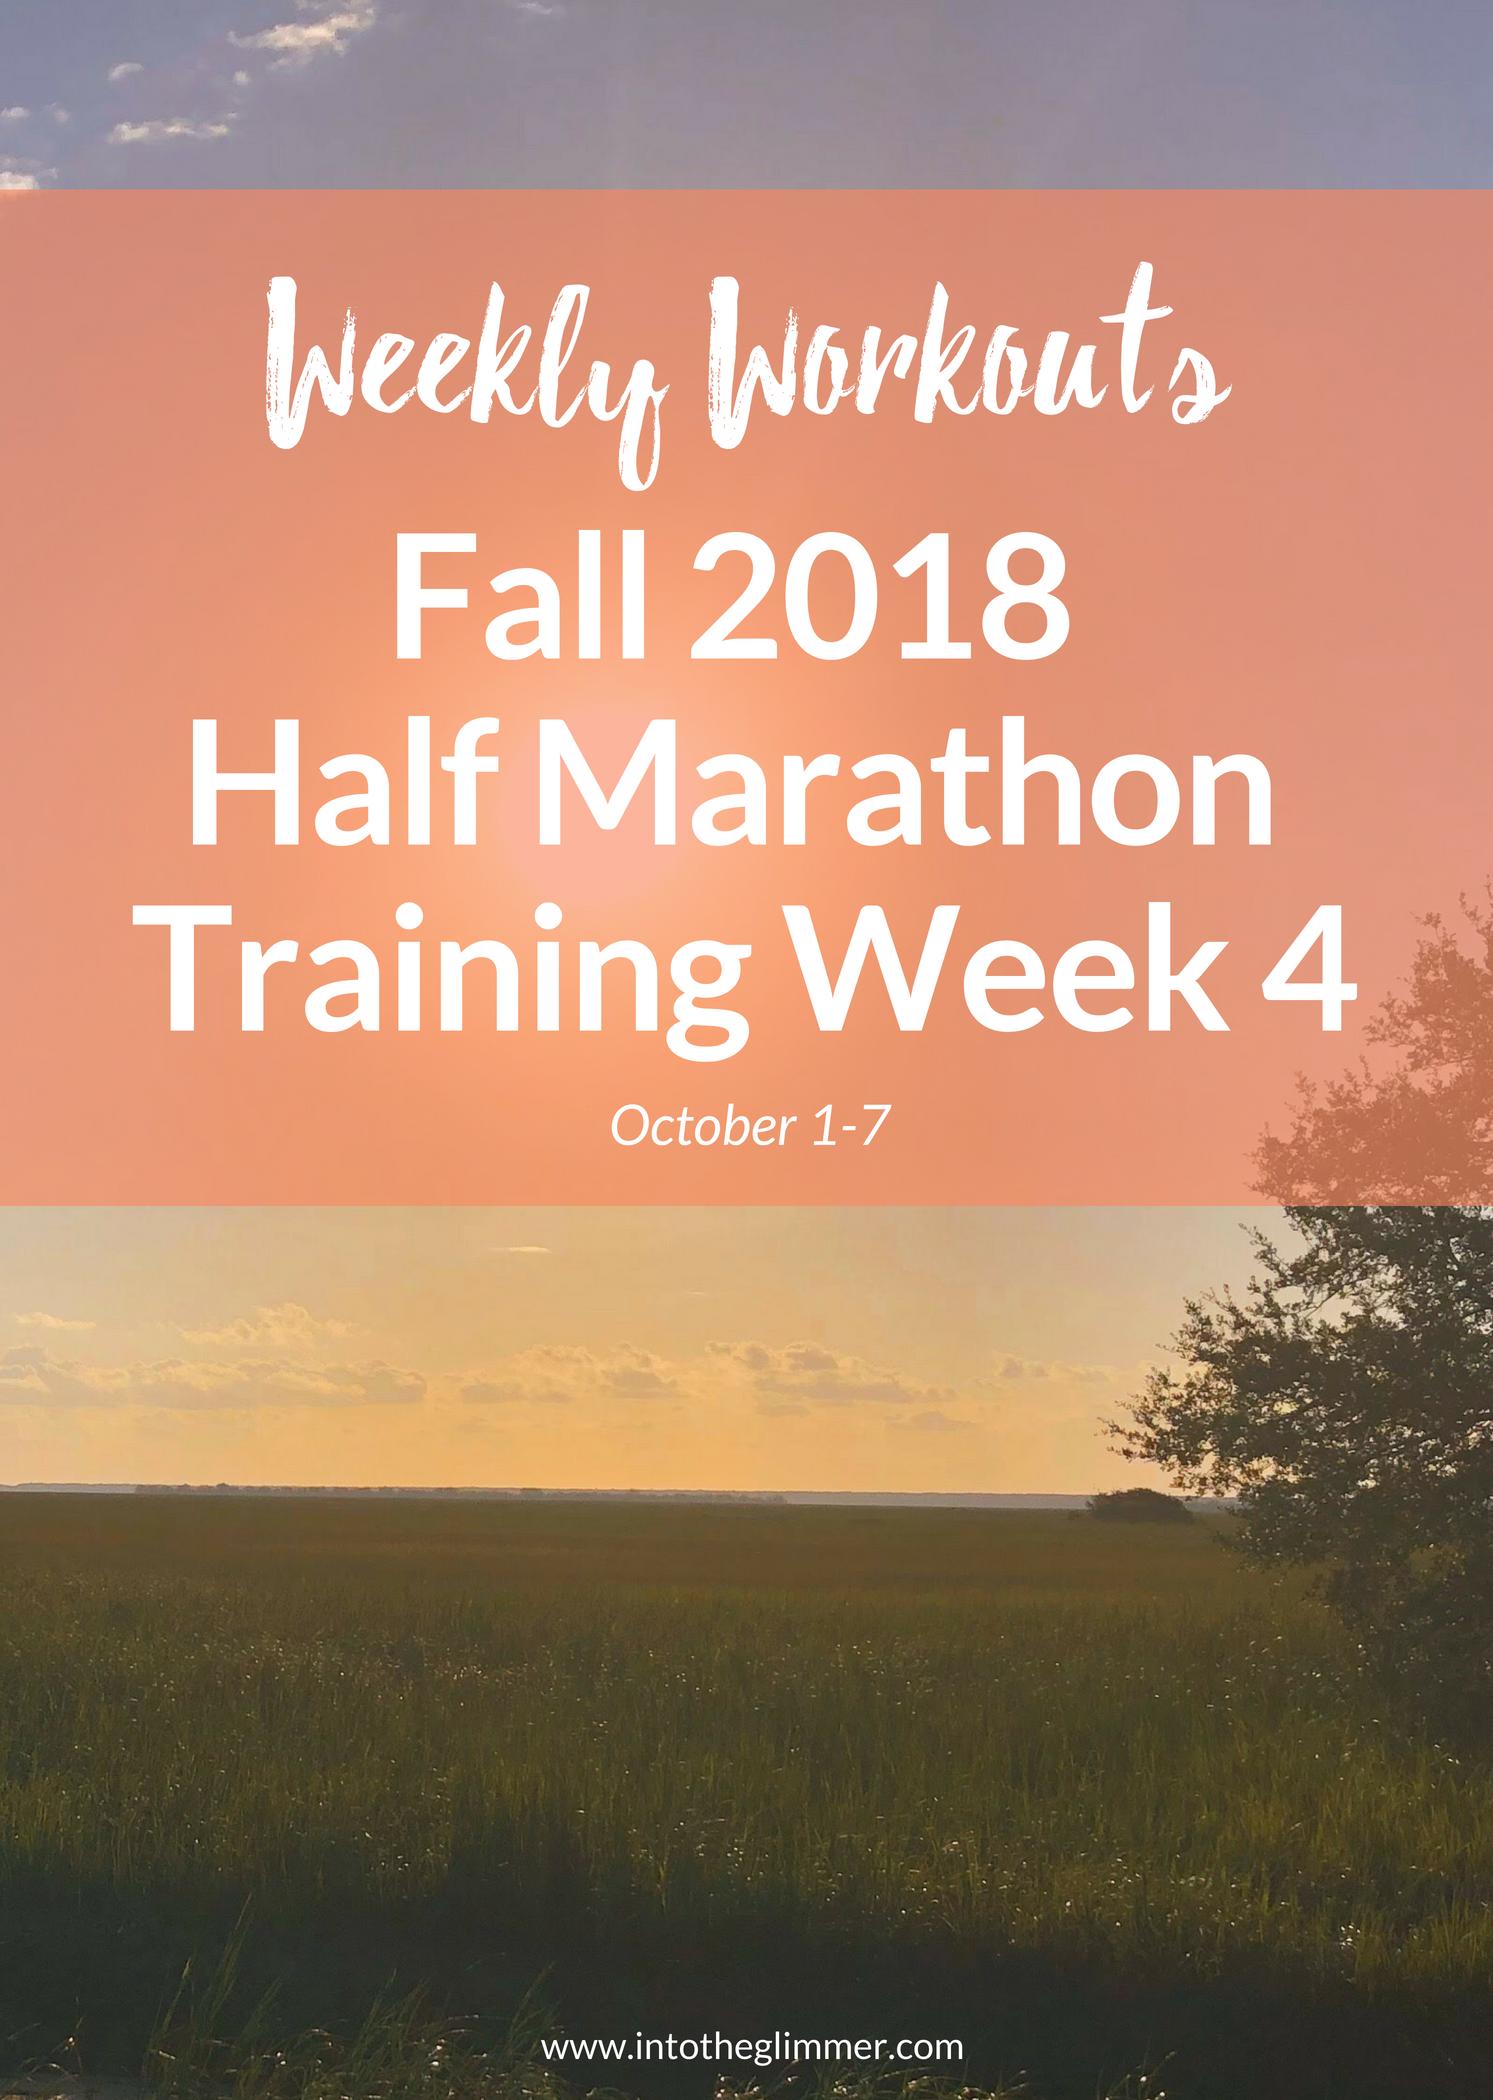 weekly recap fall 2018 half marathon training week 4